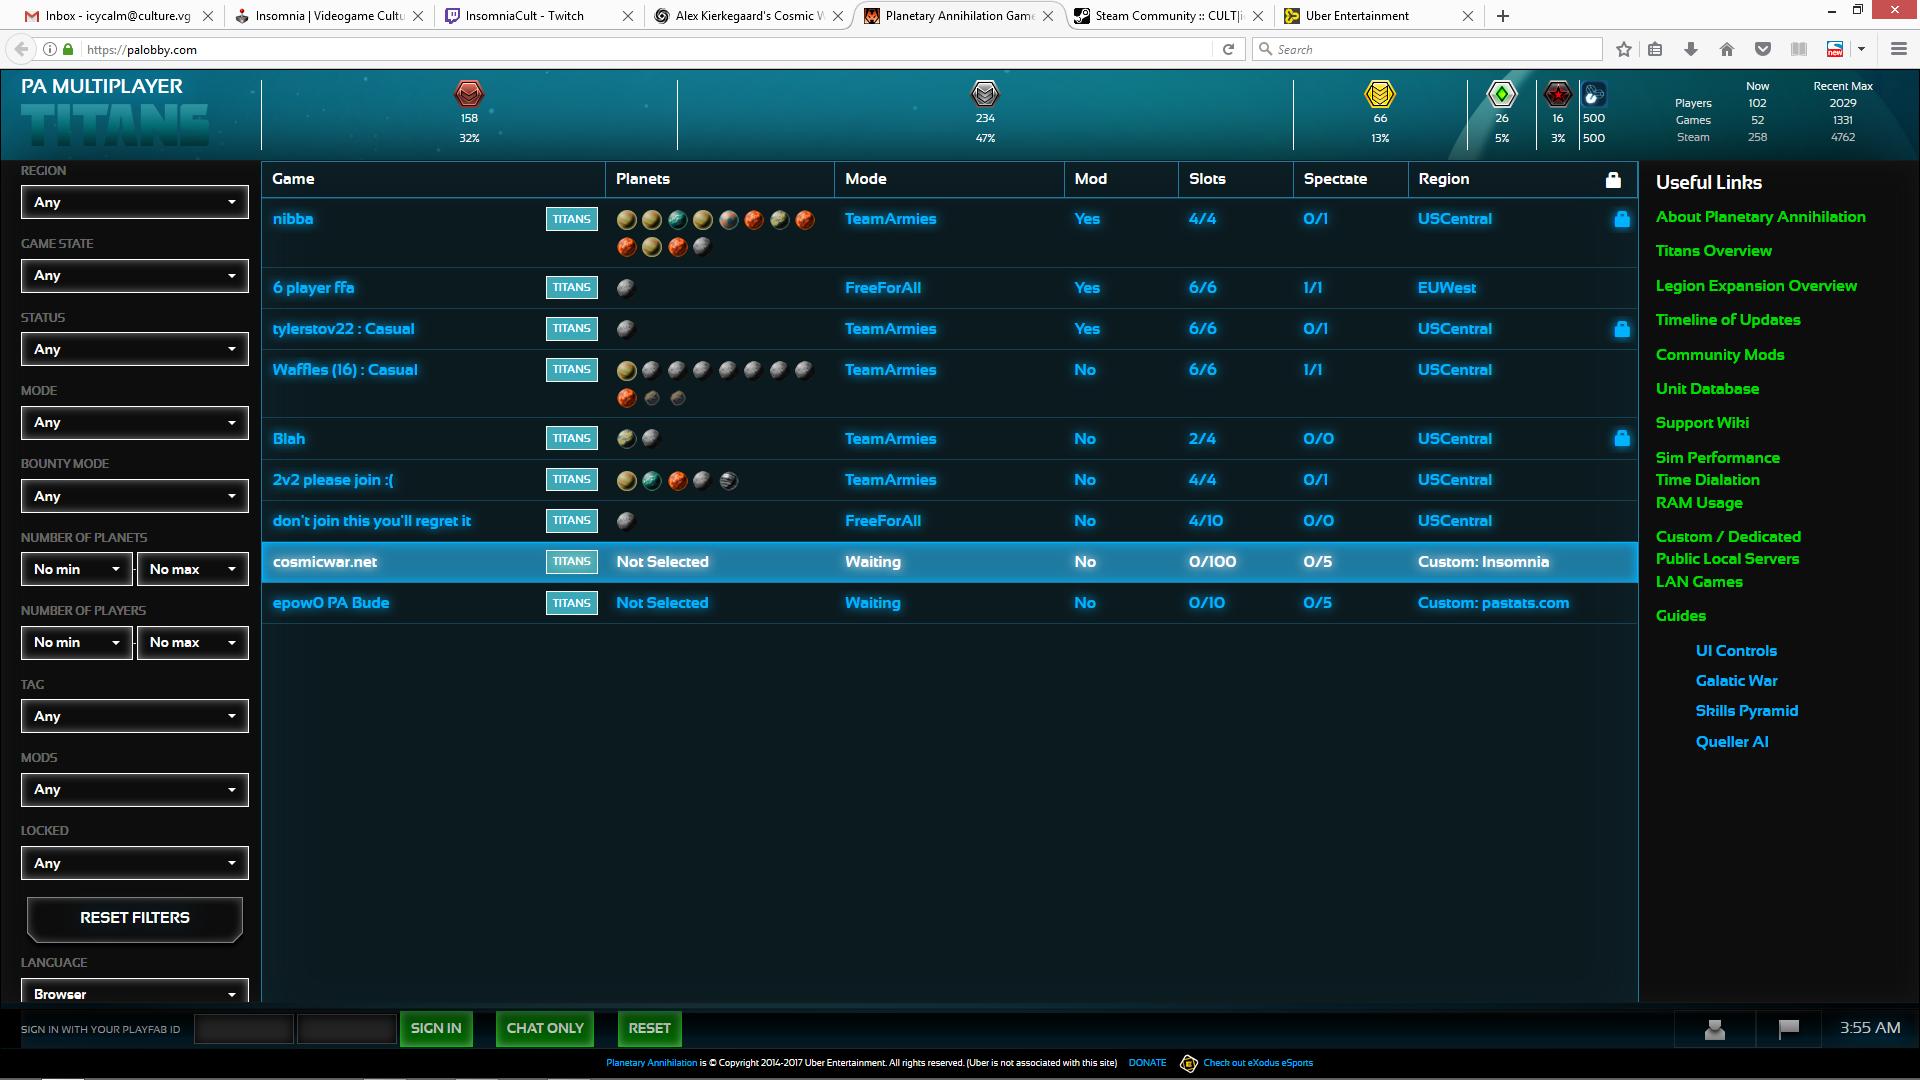 Screenshot (56).png